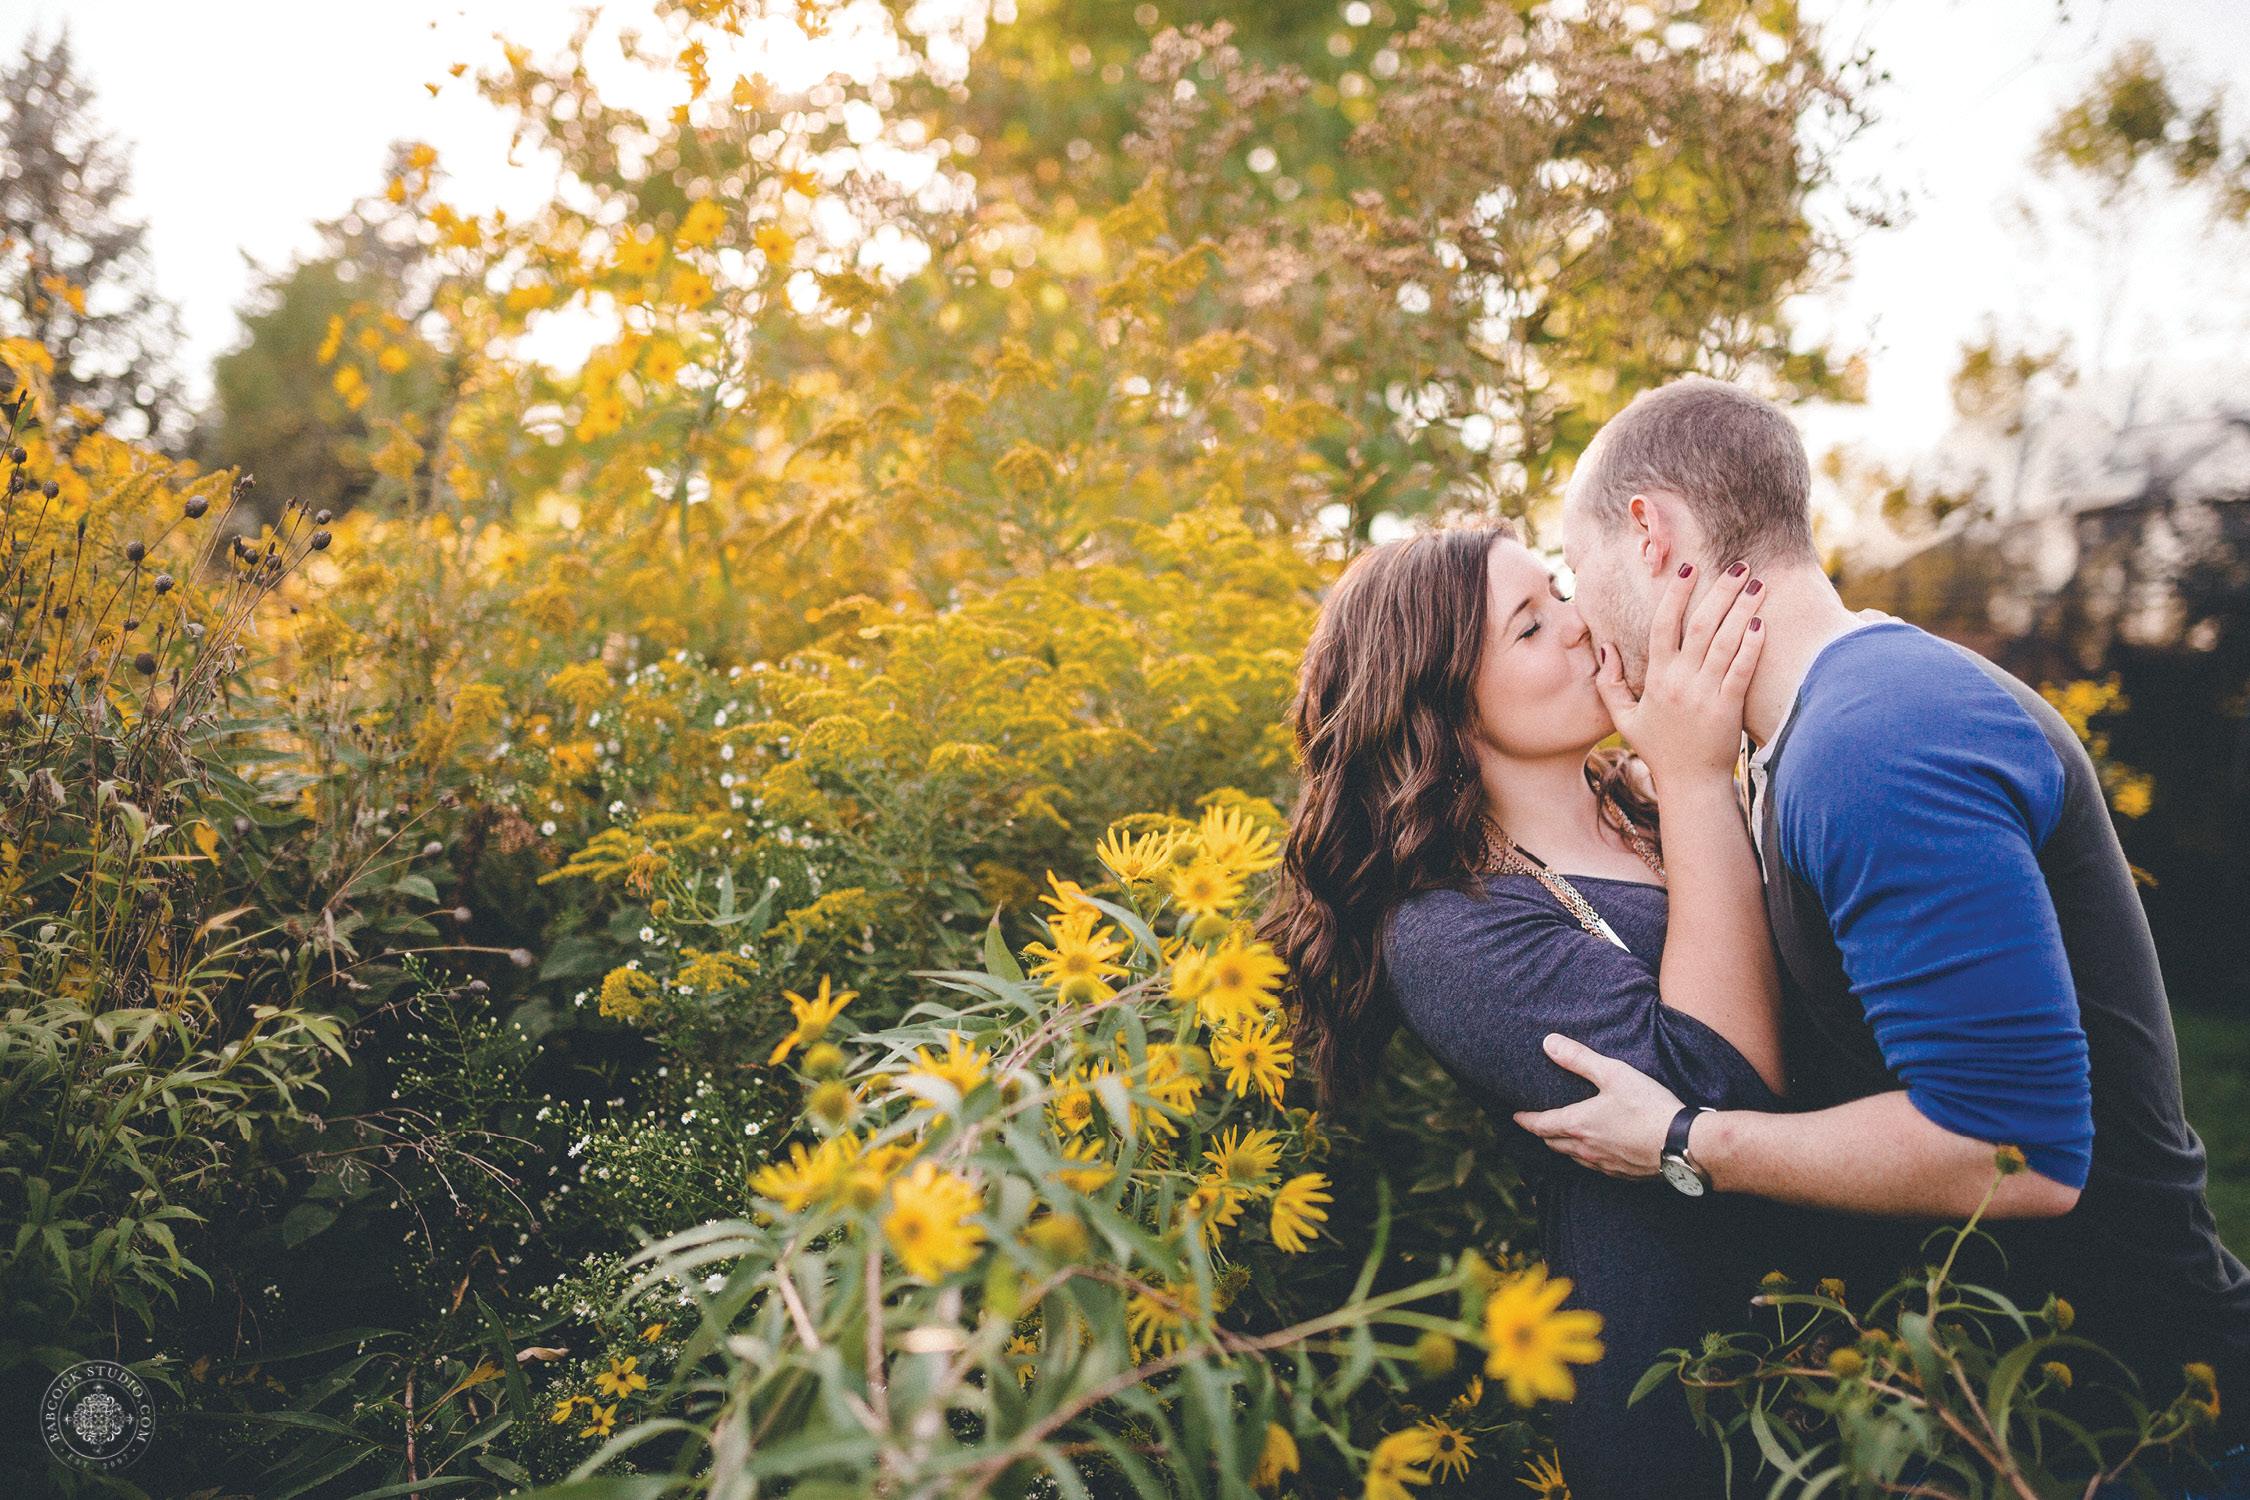 kristen-tom-engagement-photographer-dayton-ohio-fb-4.jpg